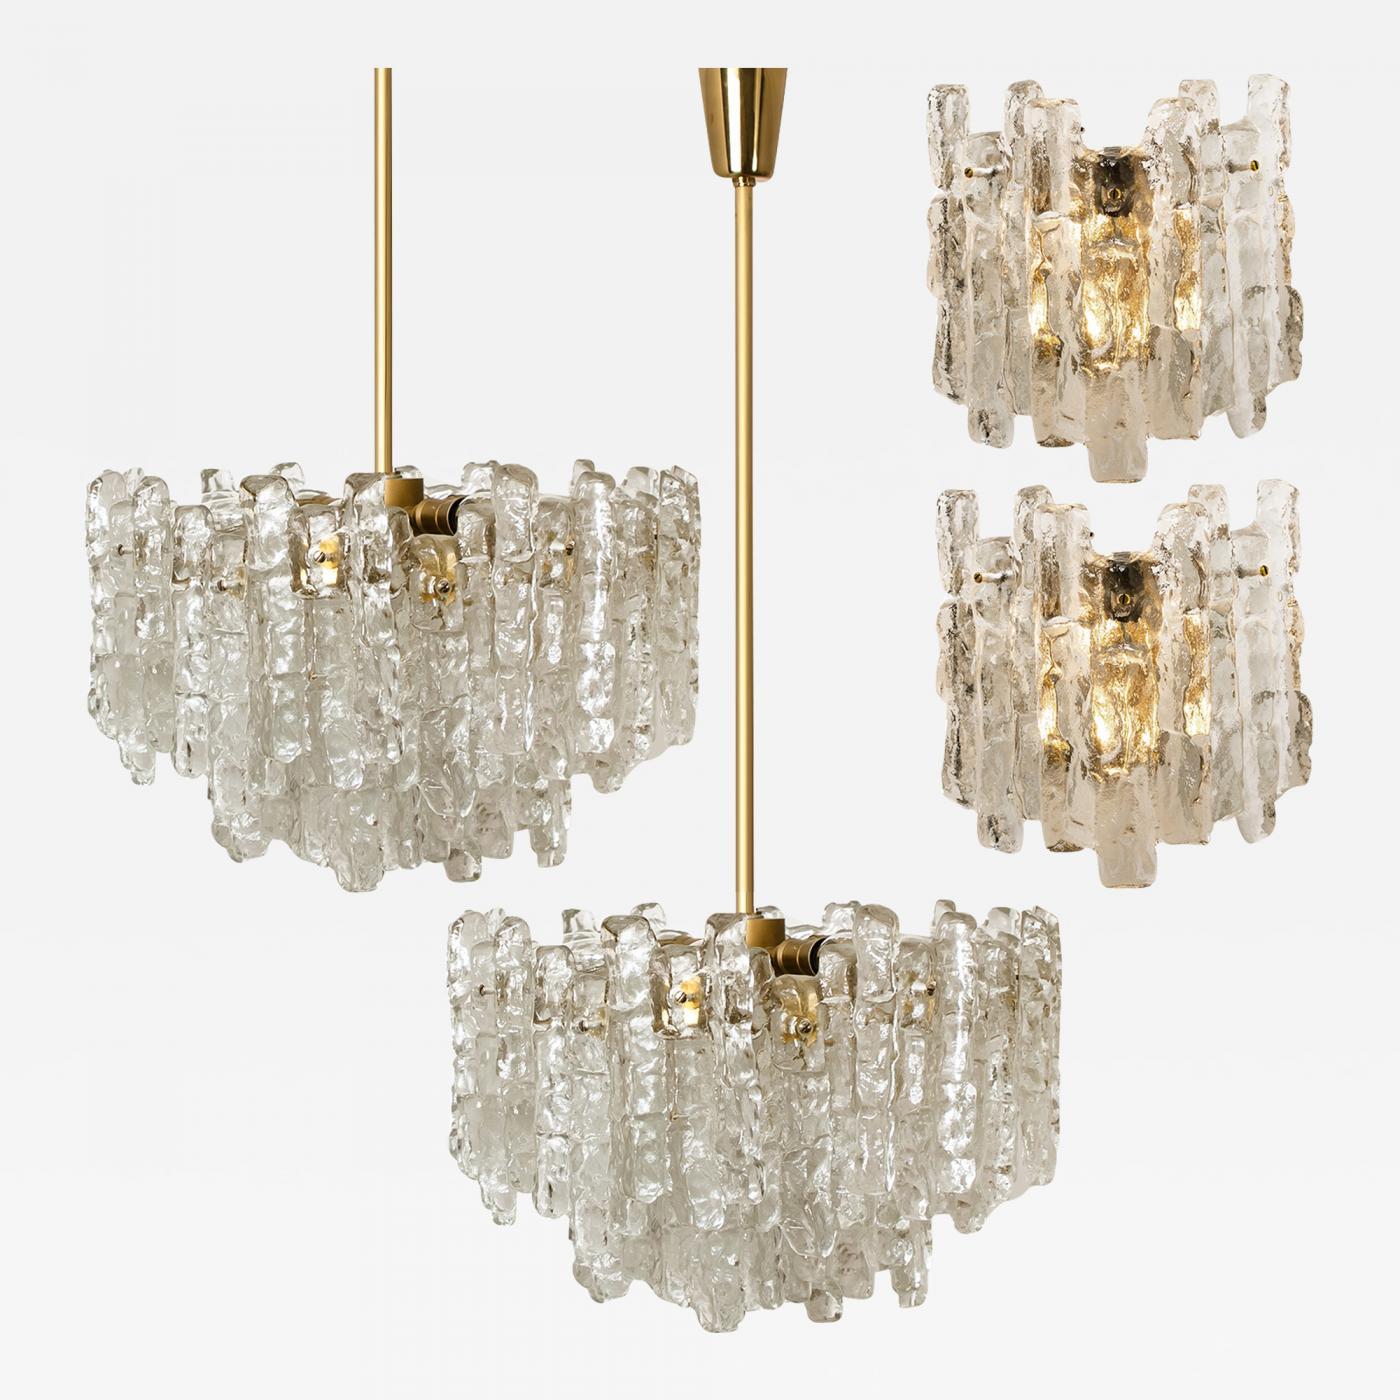 buy popular cf3b5 b023a J.T. Kalmar – Kalmar Lighting - Set of Four Kalmar Ice Glass Light  Fixtures, Two Wall Sconces & Two Chandeliers